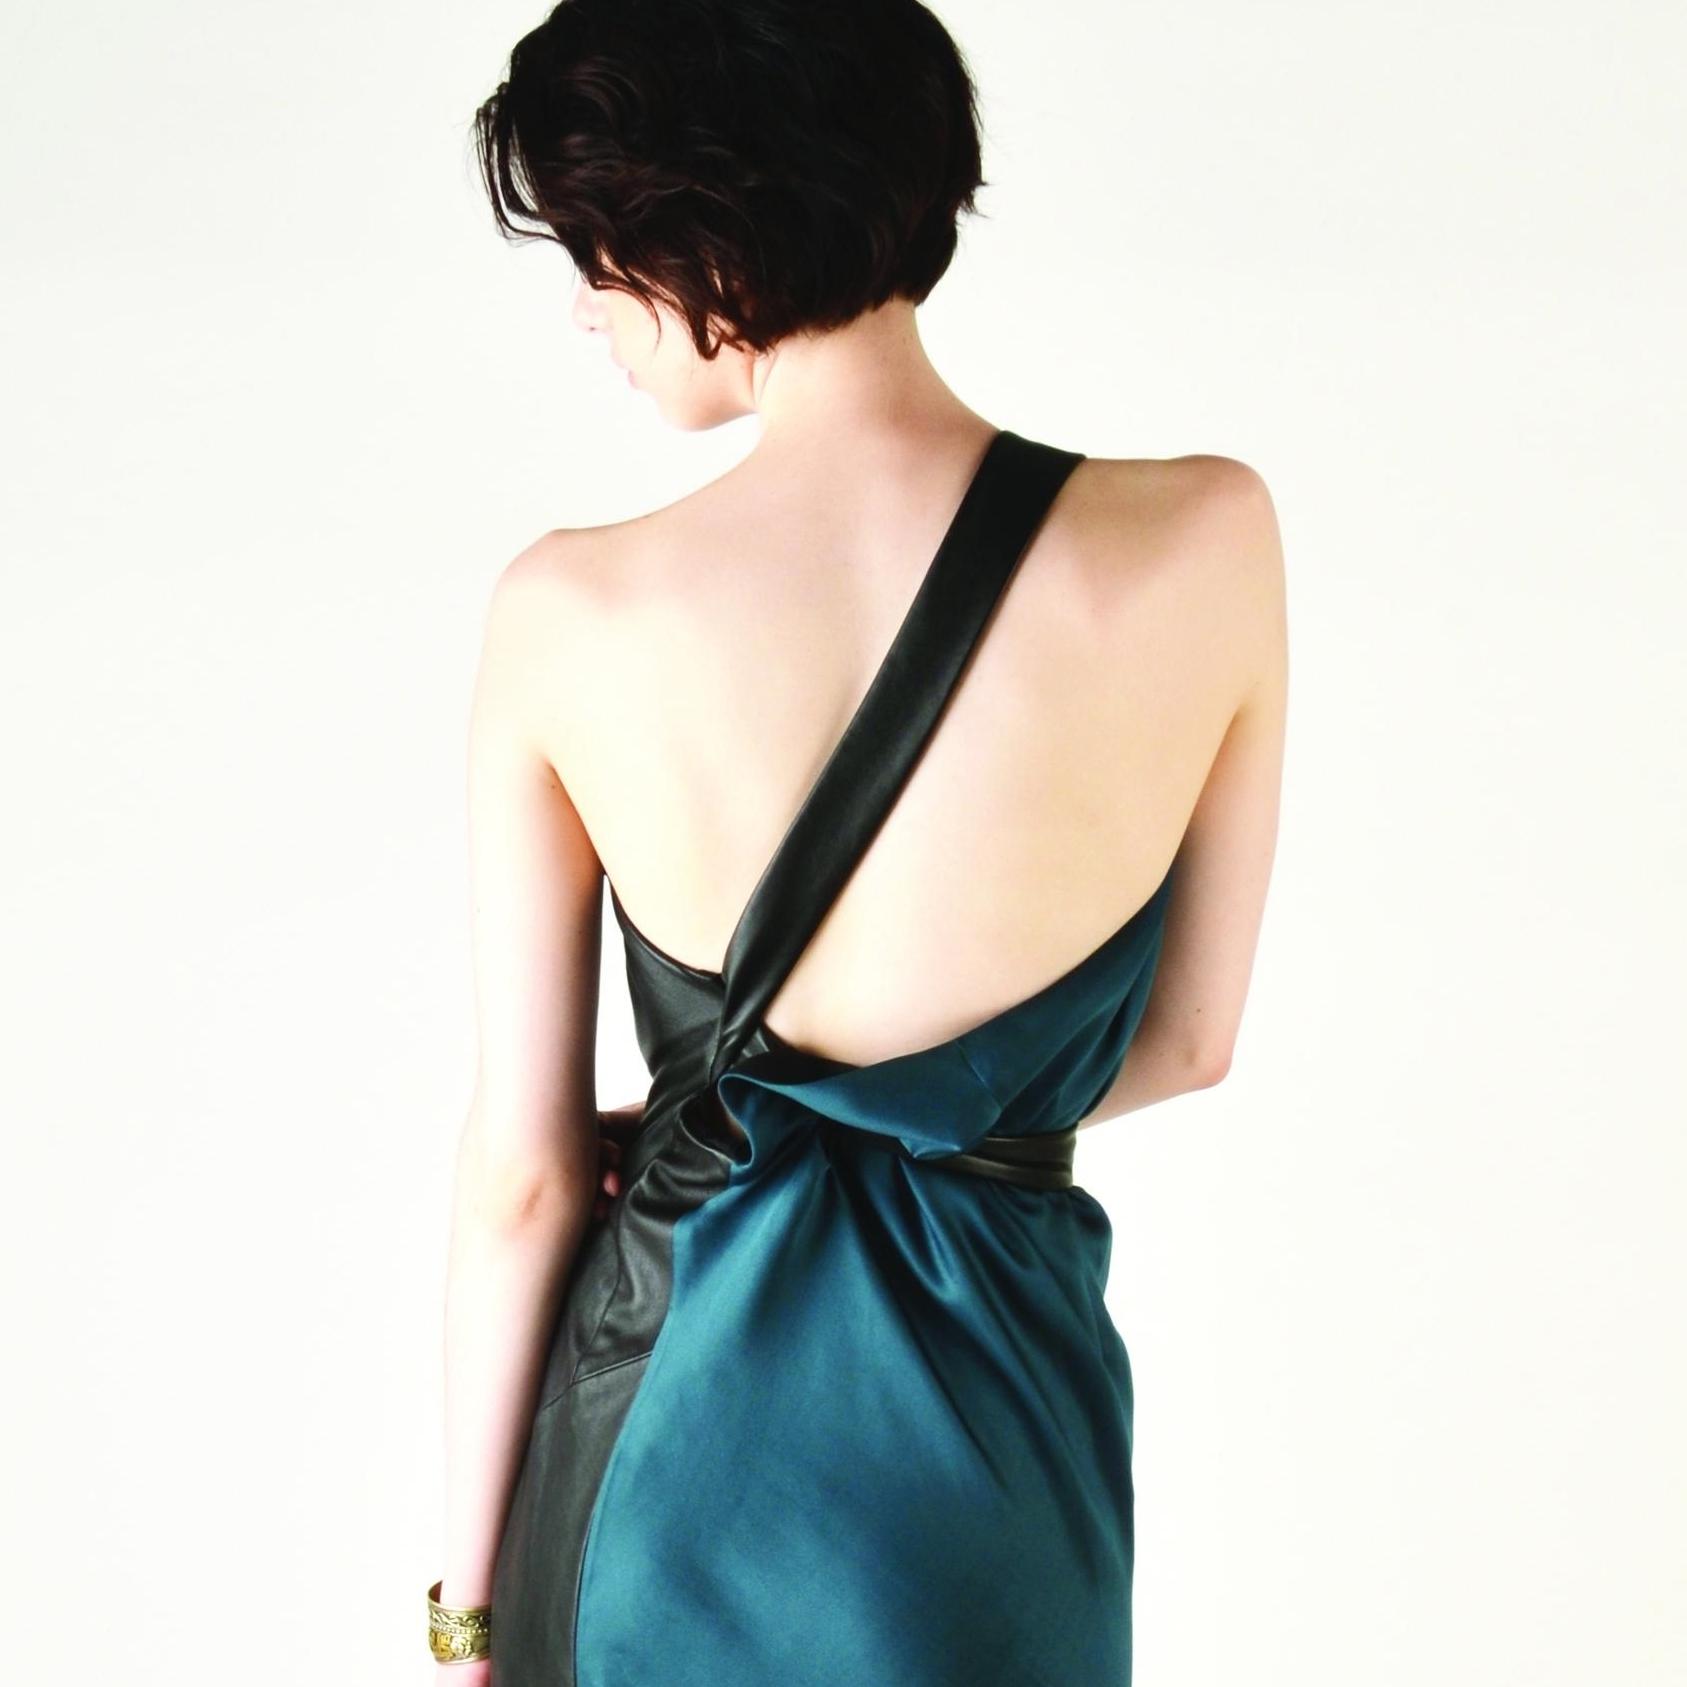 Contrast Gown Back Crop 6x6.jpg